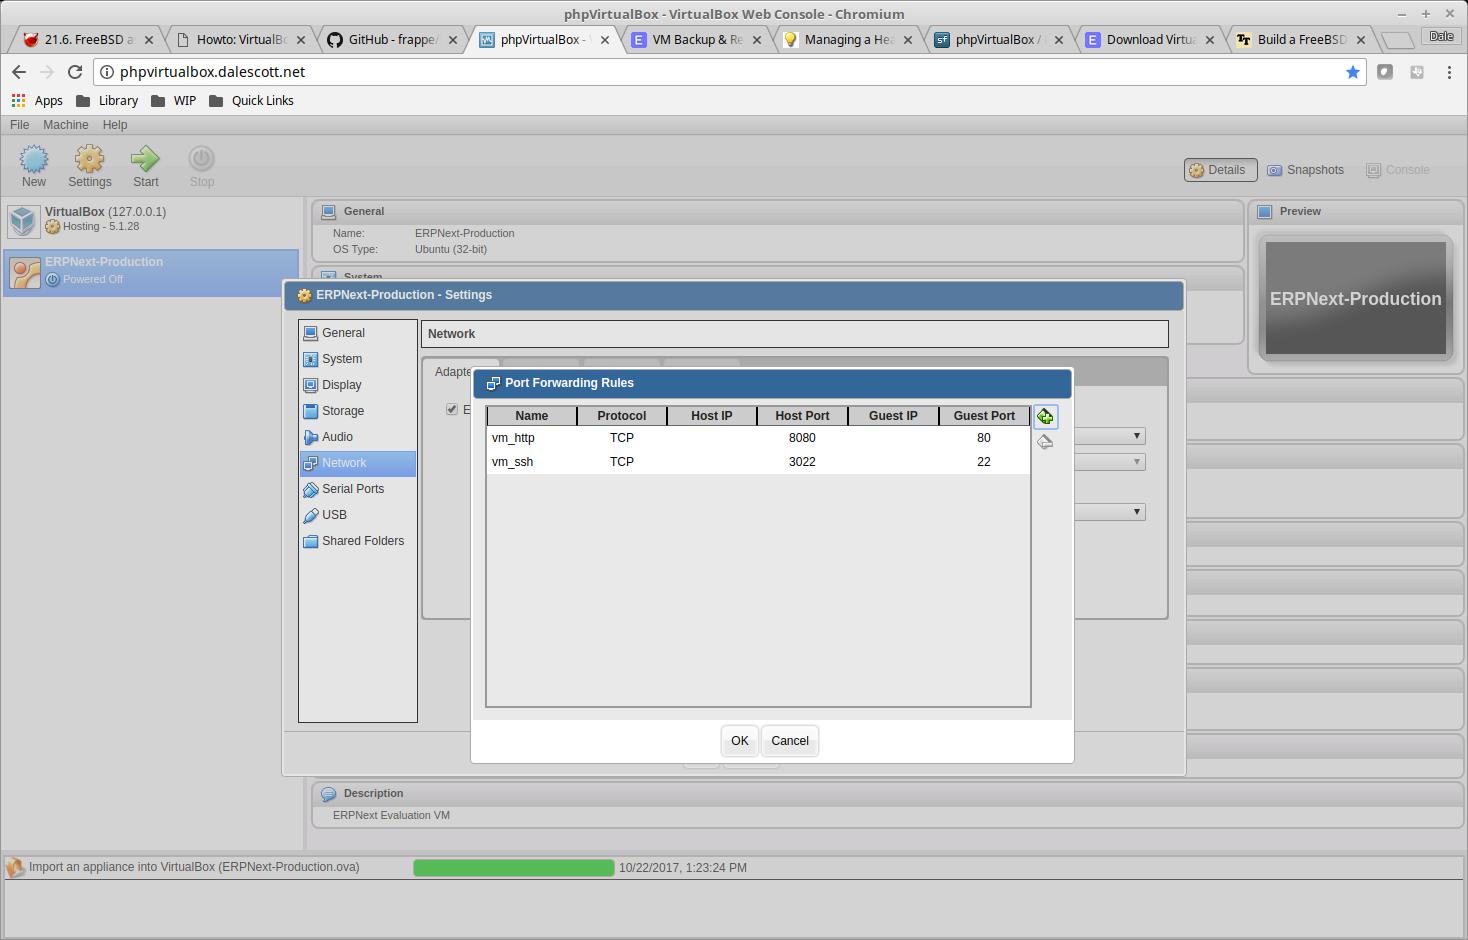 Install ERPNext on FreeBSD 11 2 using VirtualBox – Dale